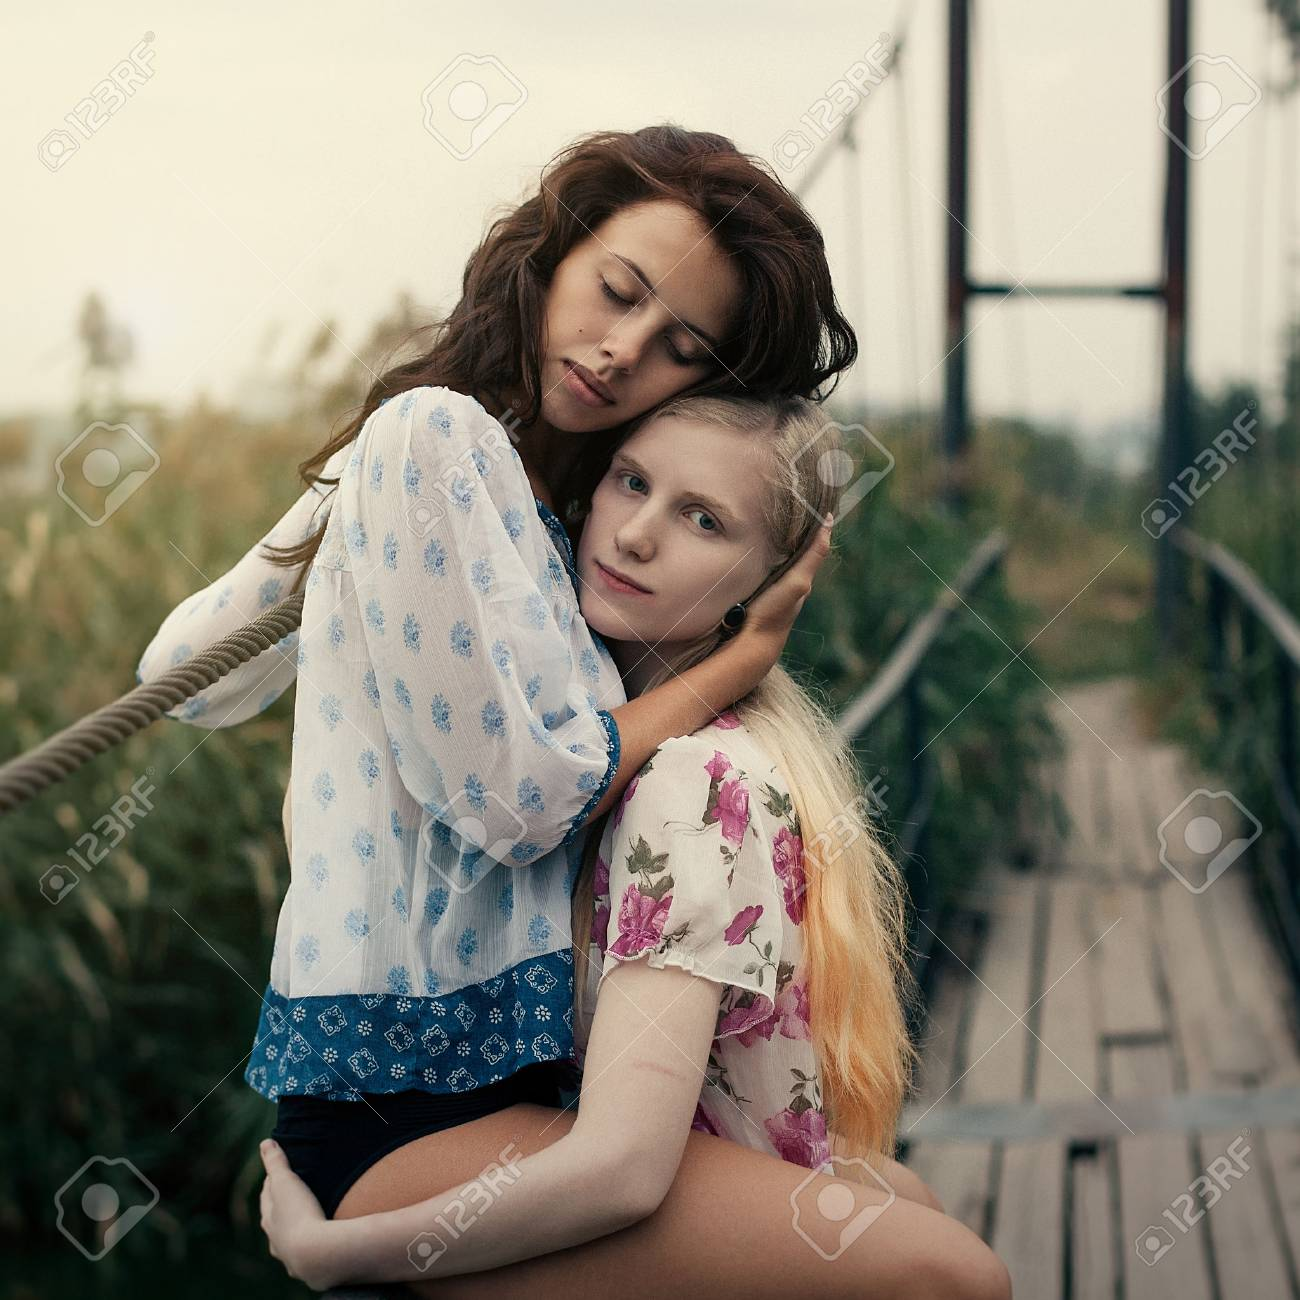 Jonge lesbiennes pics